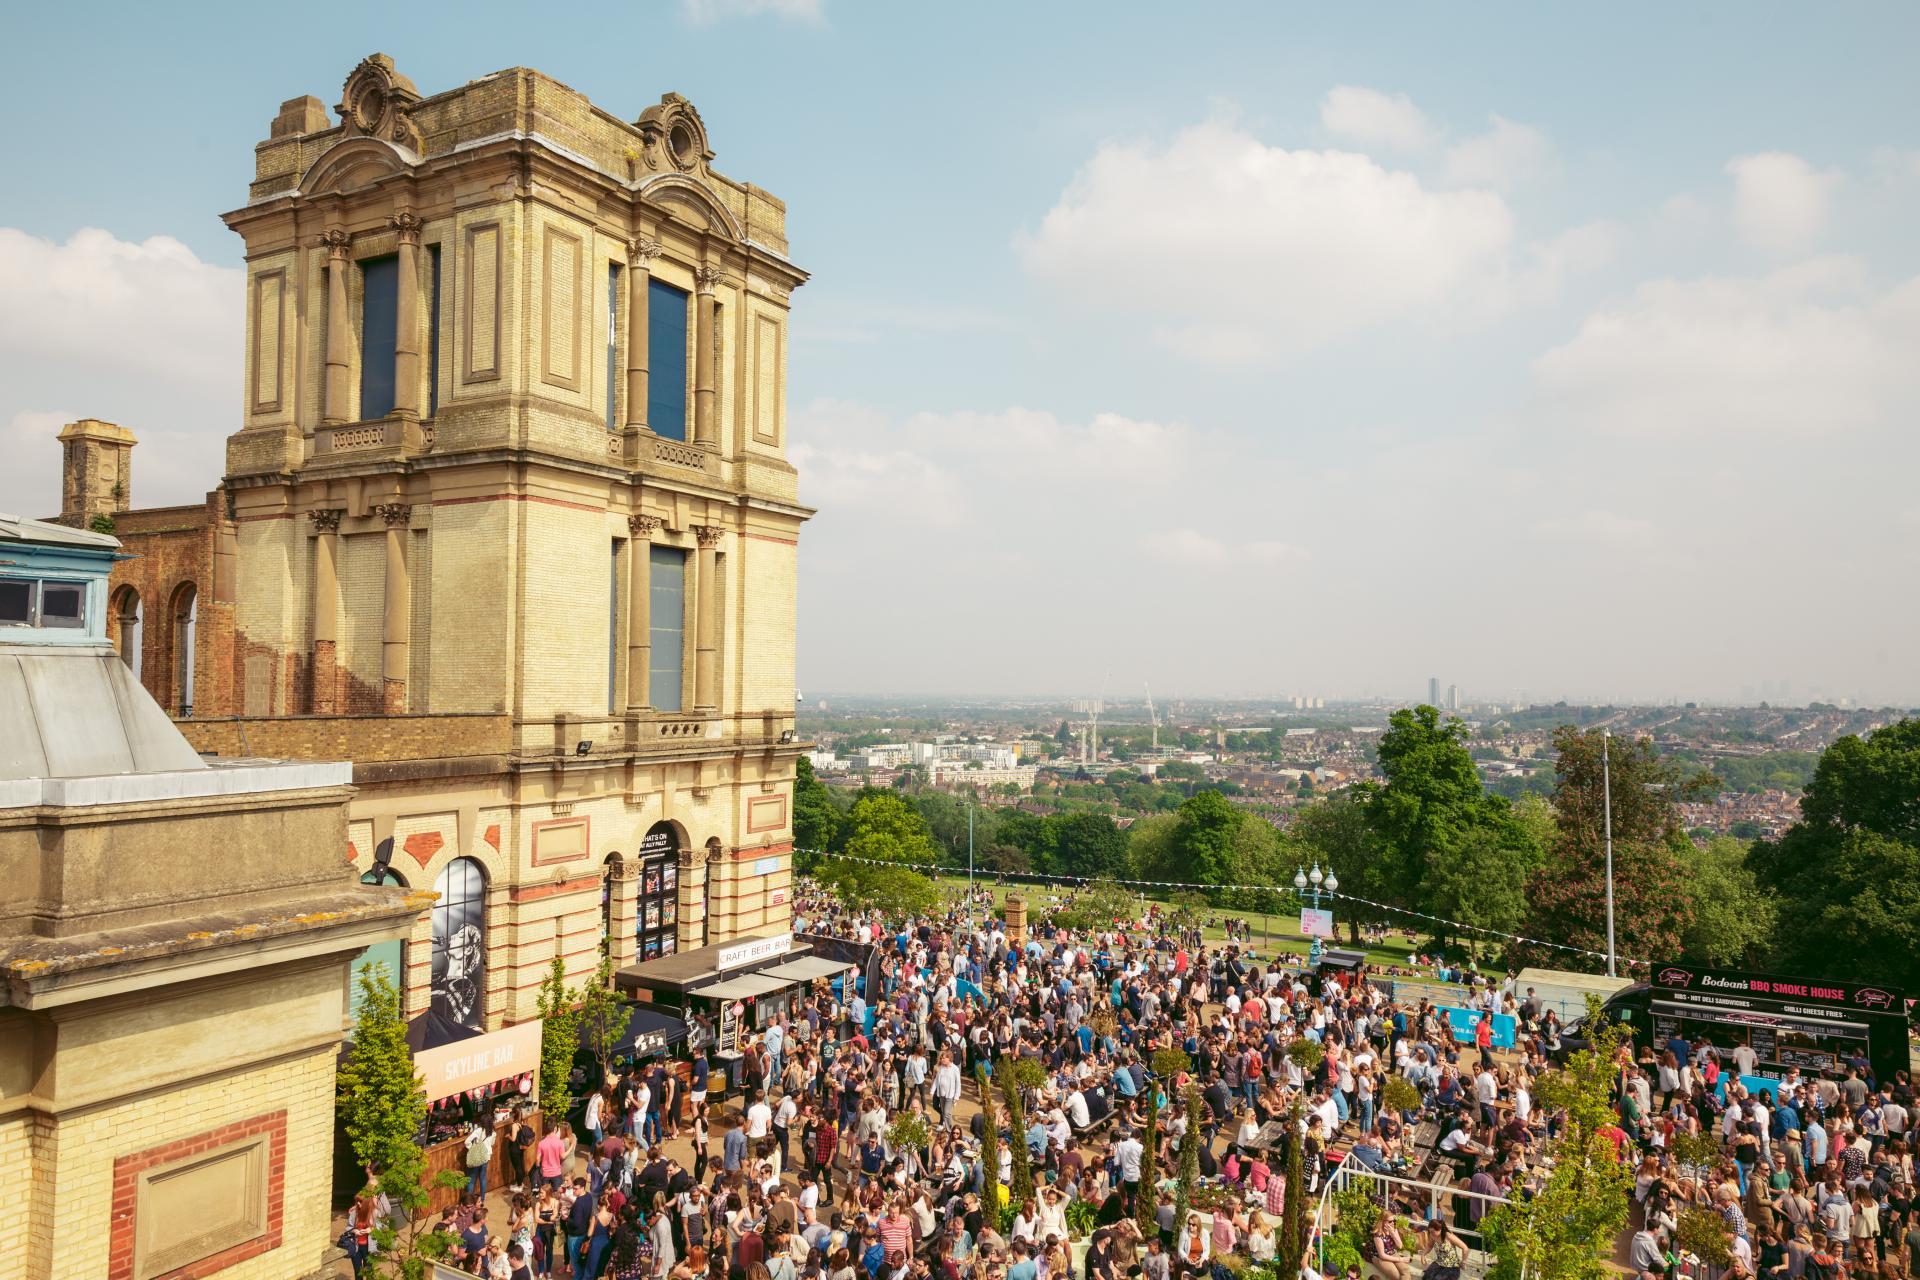 Summer in London: StrEATlife at Alexandra Palace